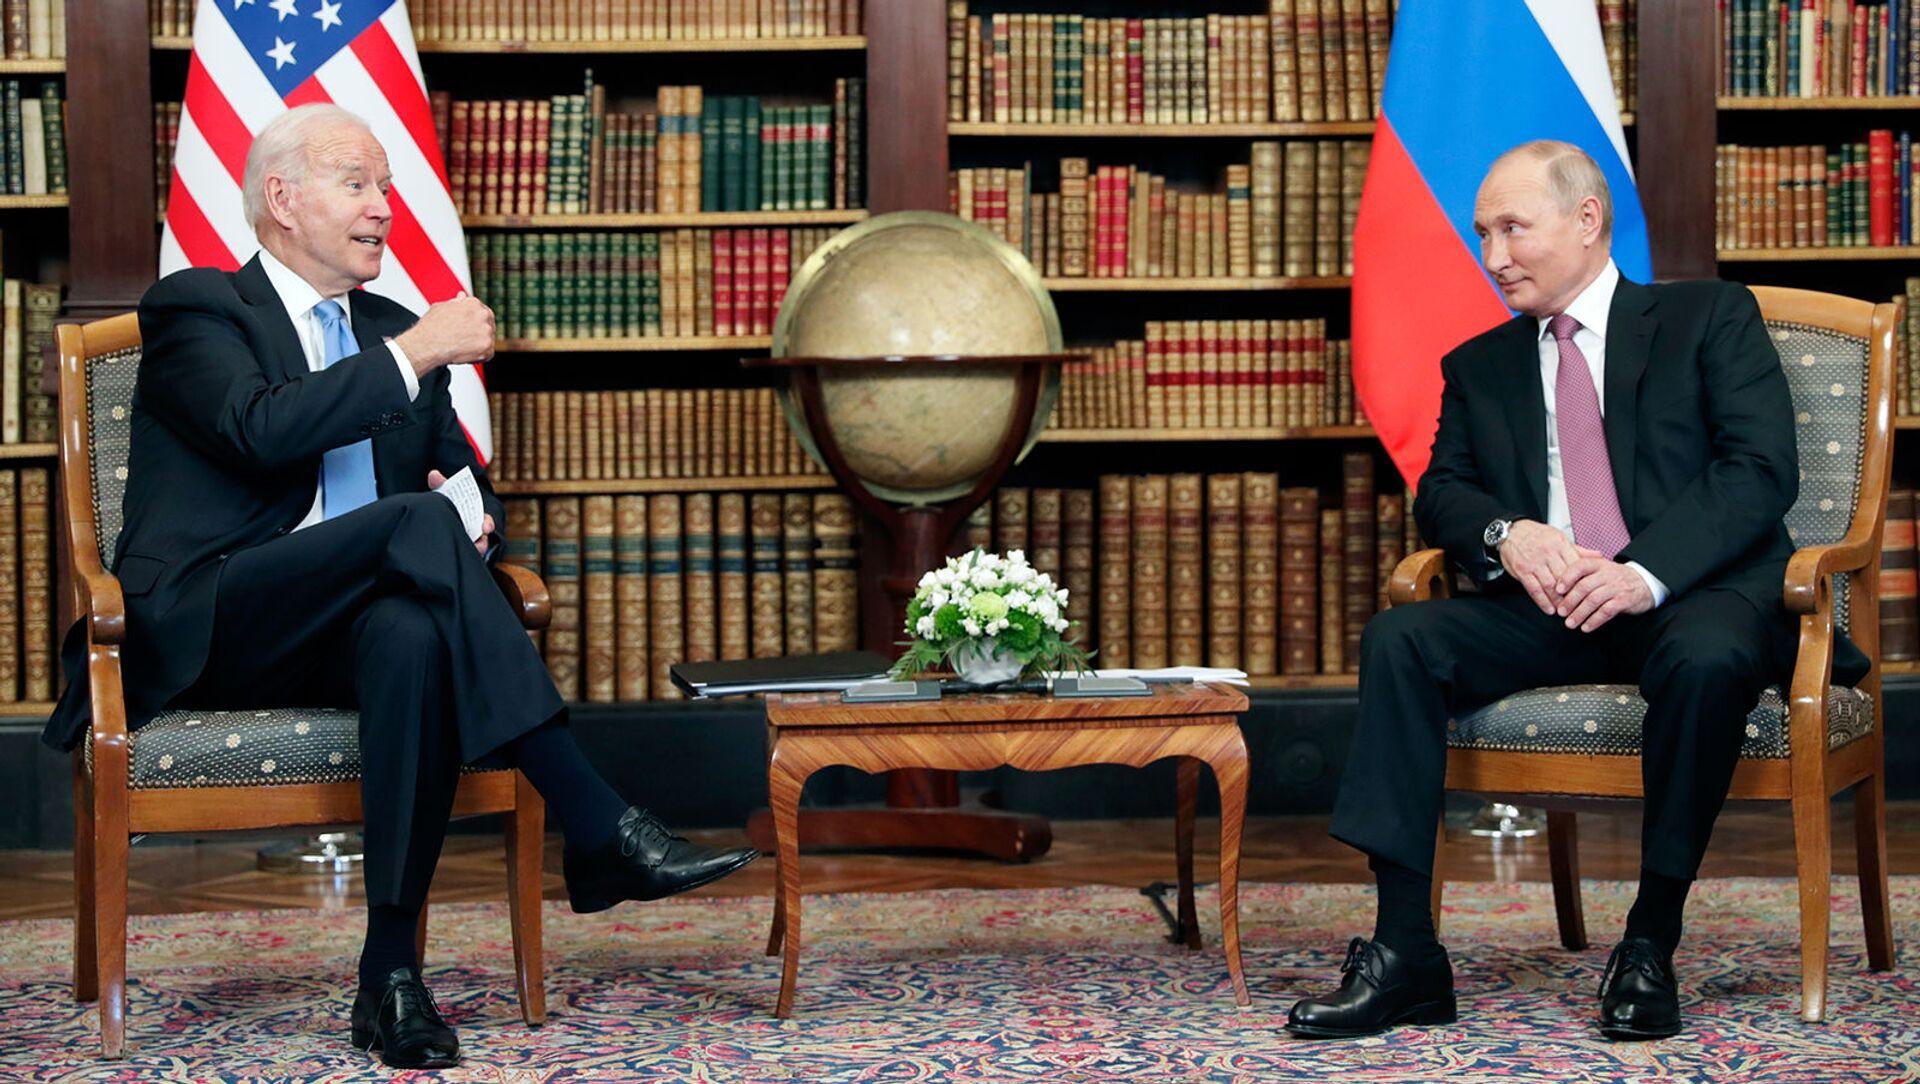 Президент России и США Владимир Путин и Джо Байден во время встречи на вилле Ла Гранж (16 июня 2021). Женева - Sputnik Армения, 1920, 06.07.2021